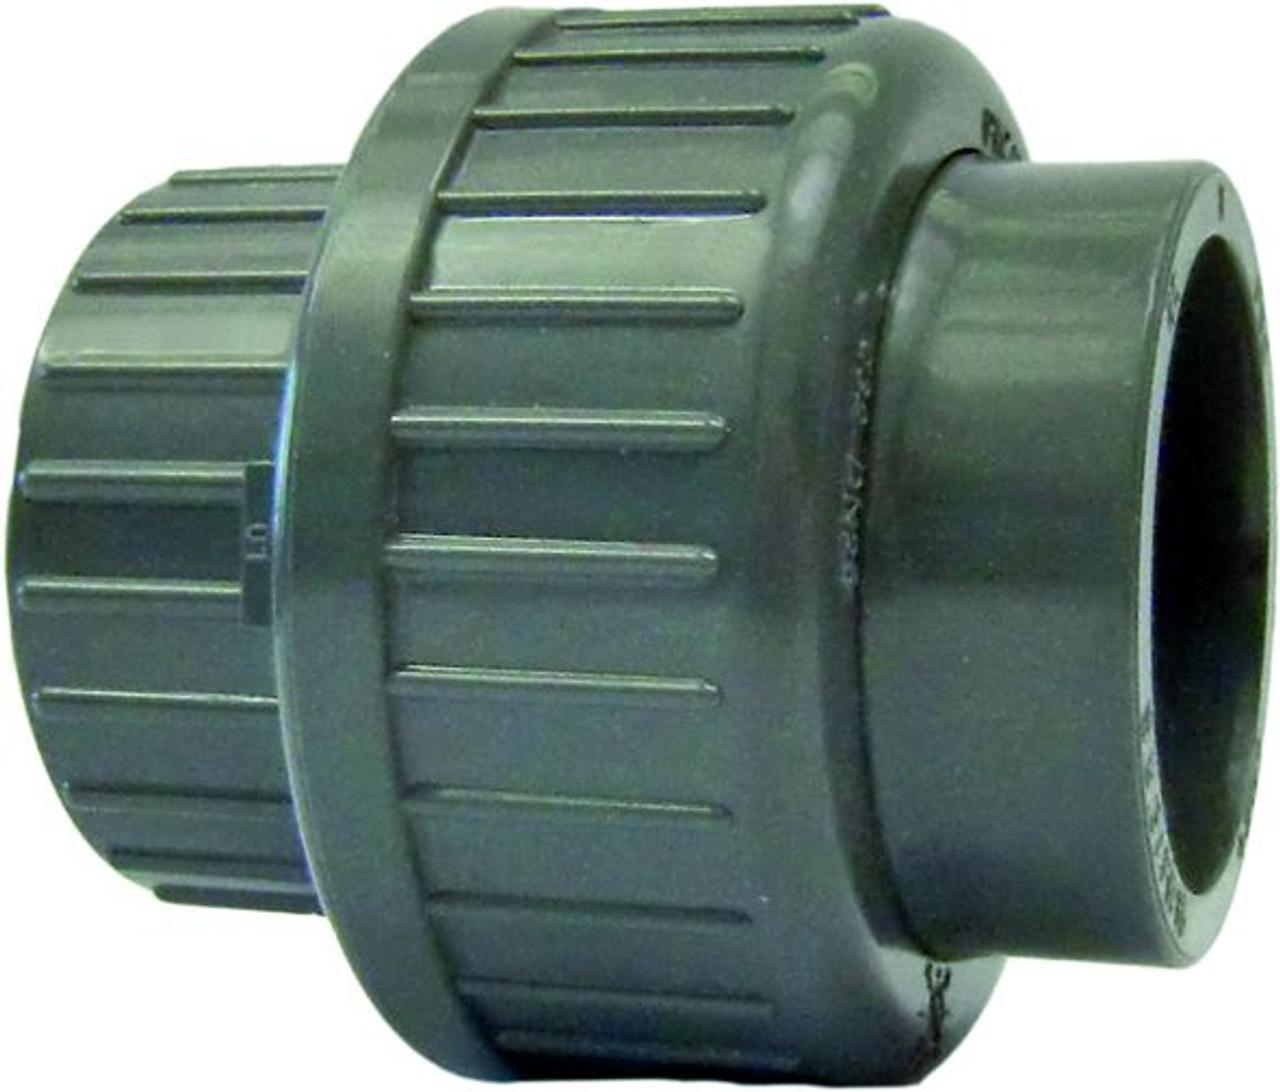 +GF+ | Union SxS PVC-U/EPDM 63DN50 (721510111)